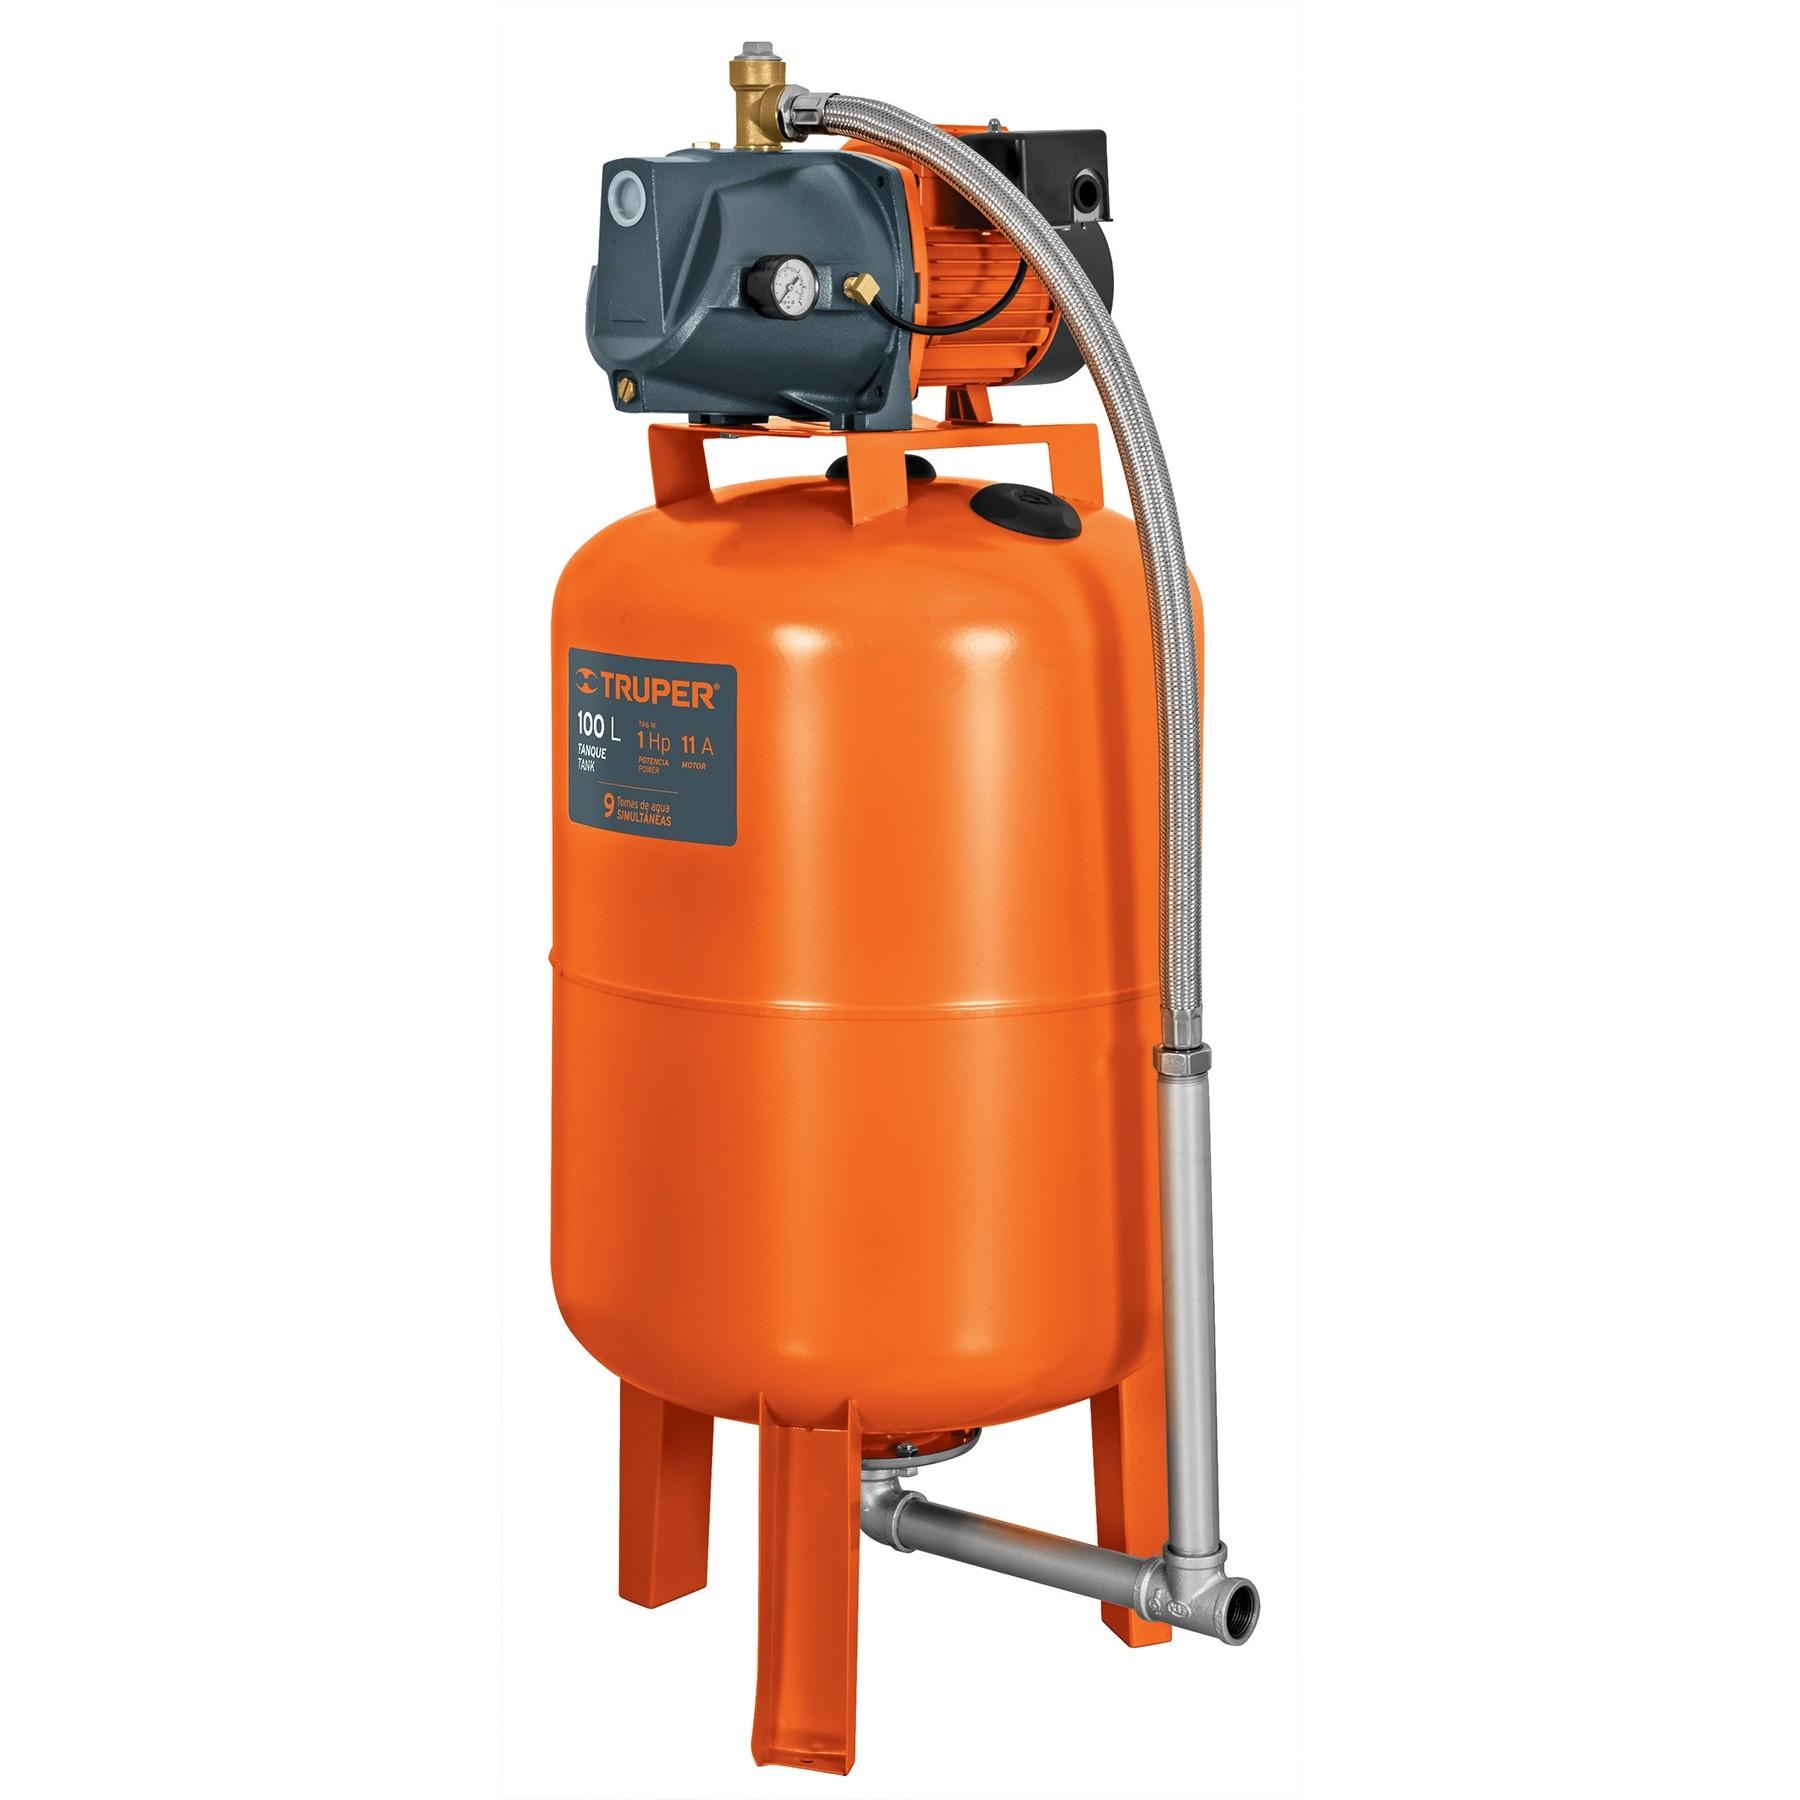 Bomba hidroneumática 1 HP, 100 litros